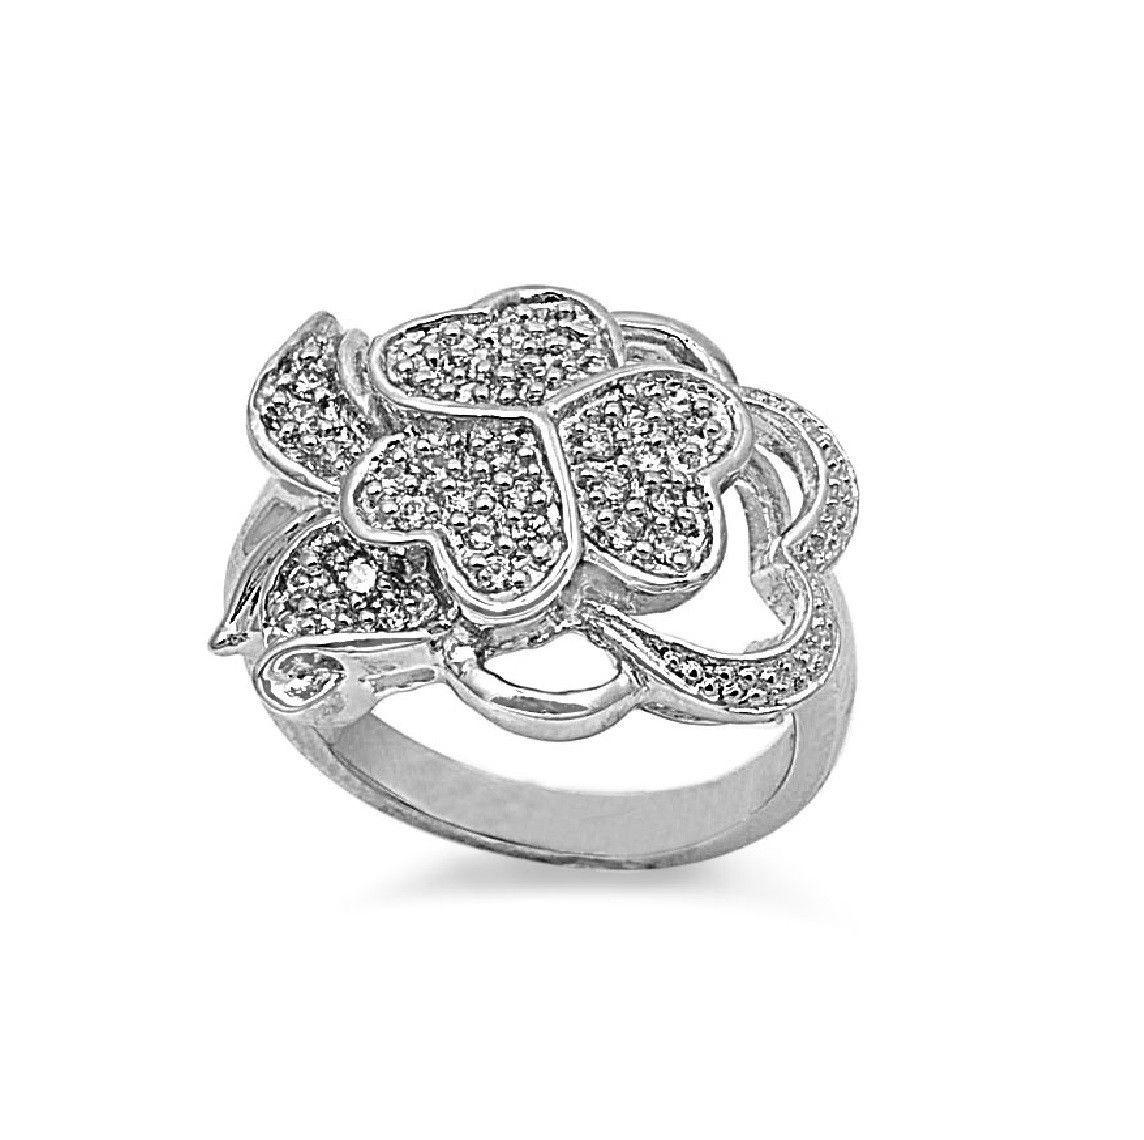 925 Sterling Silver CZ Designer Hearts Ring 13MM